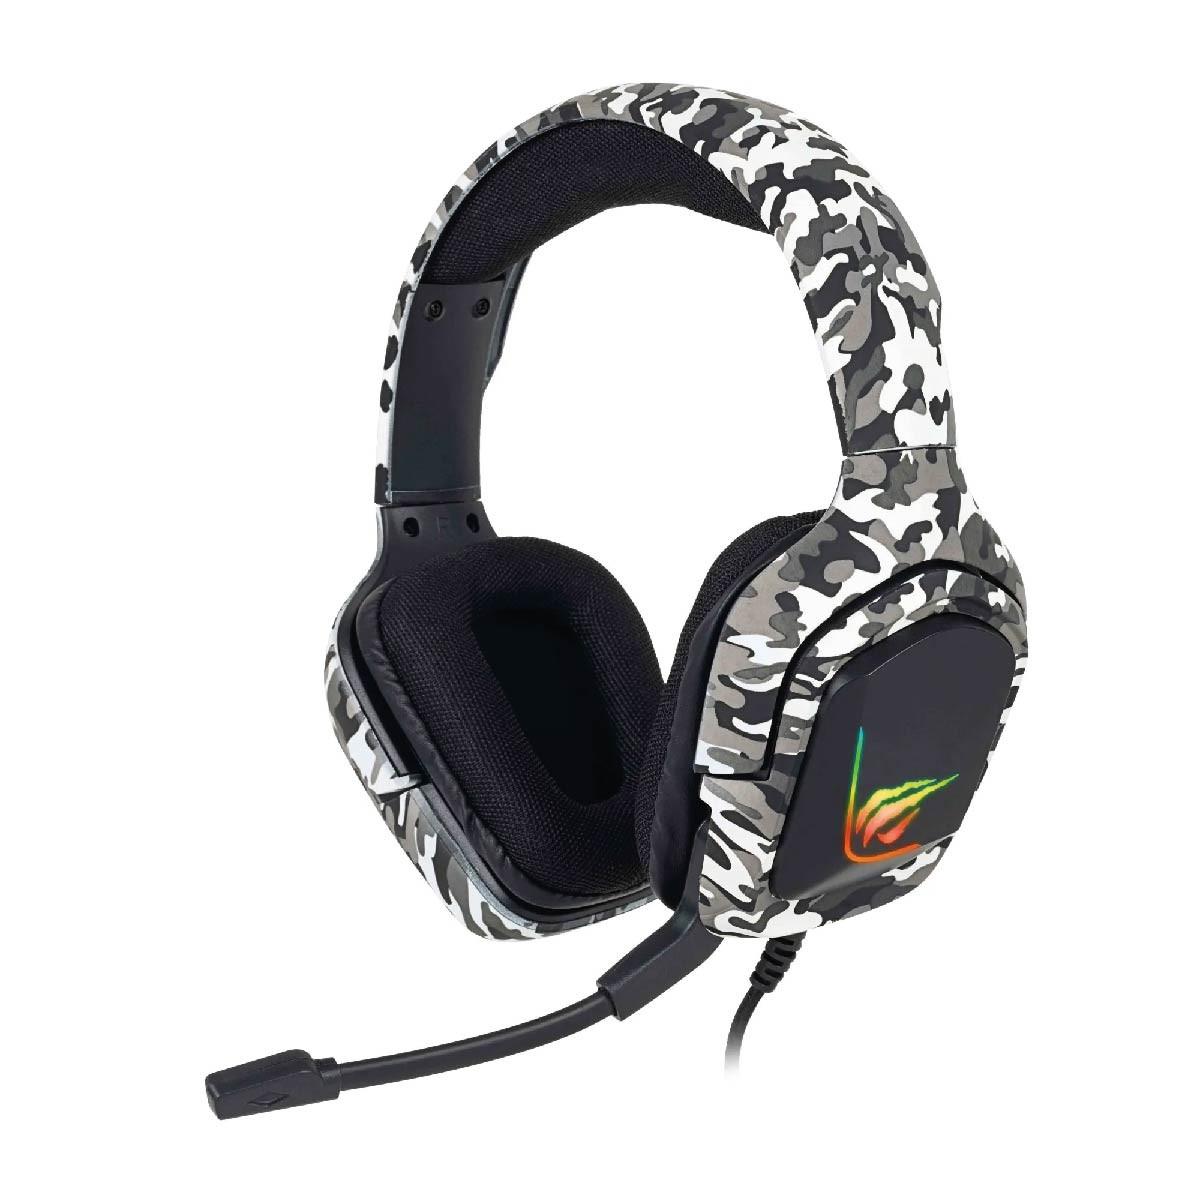 Fone de Ouvido Headset Gamer Havit H653d Cinza